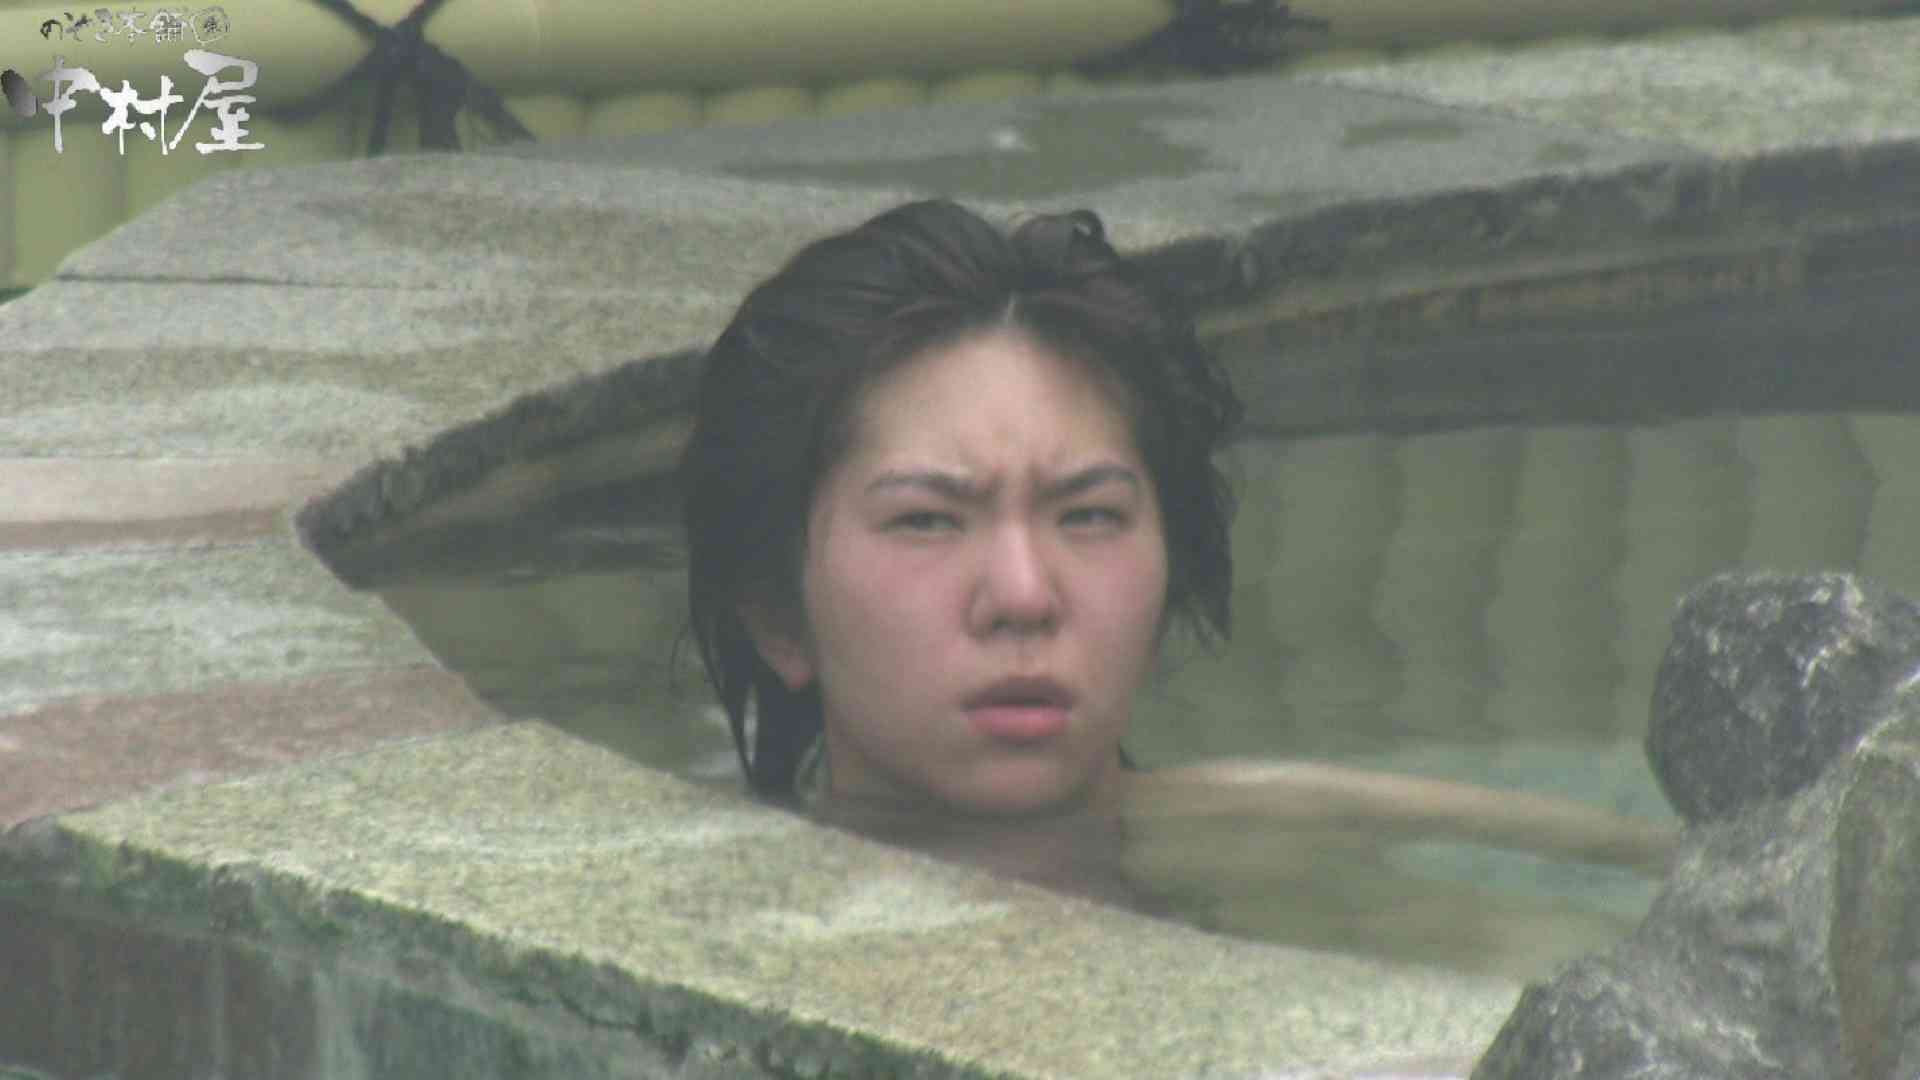 Aquaな露天風呂Vol.907 OL女体  95連発 18